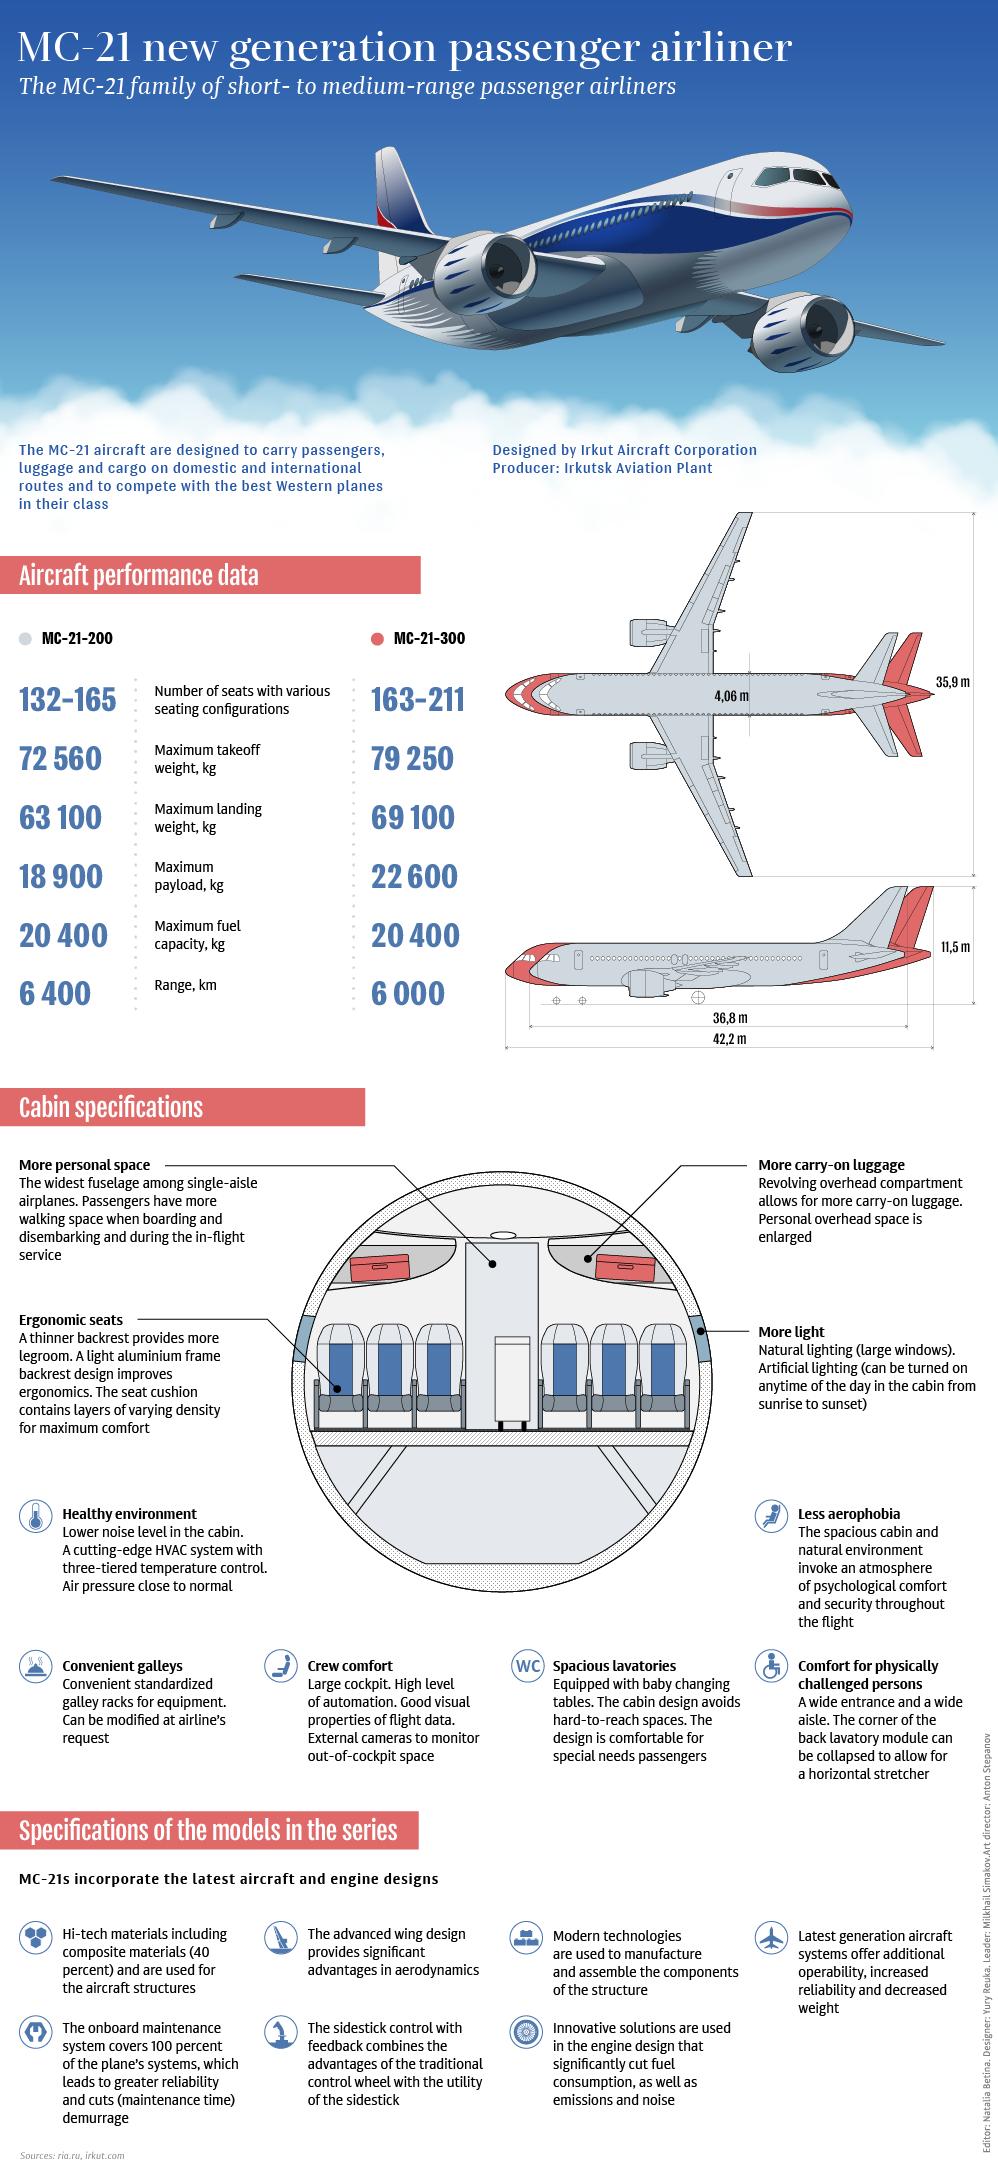 MC-21 new generation passenger airliner